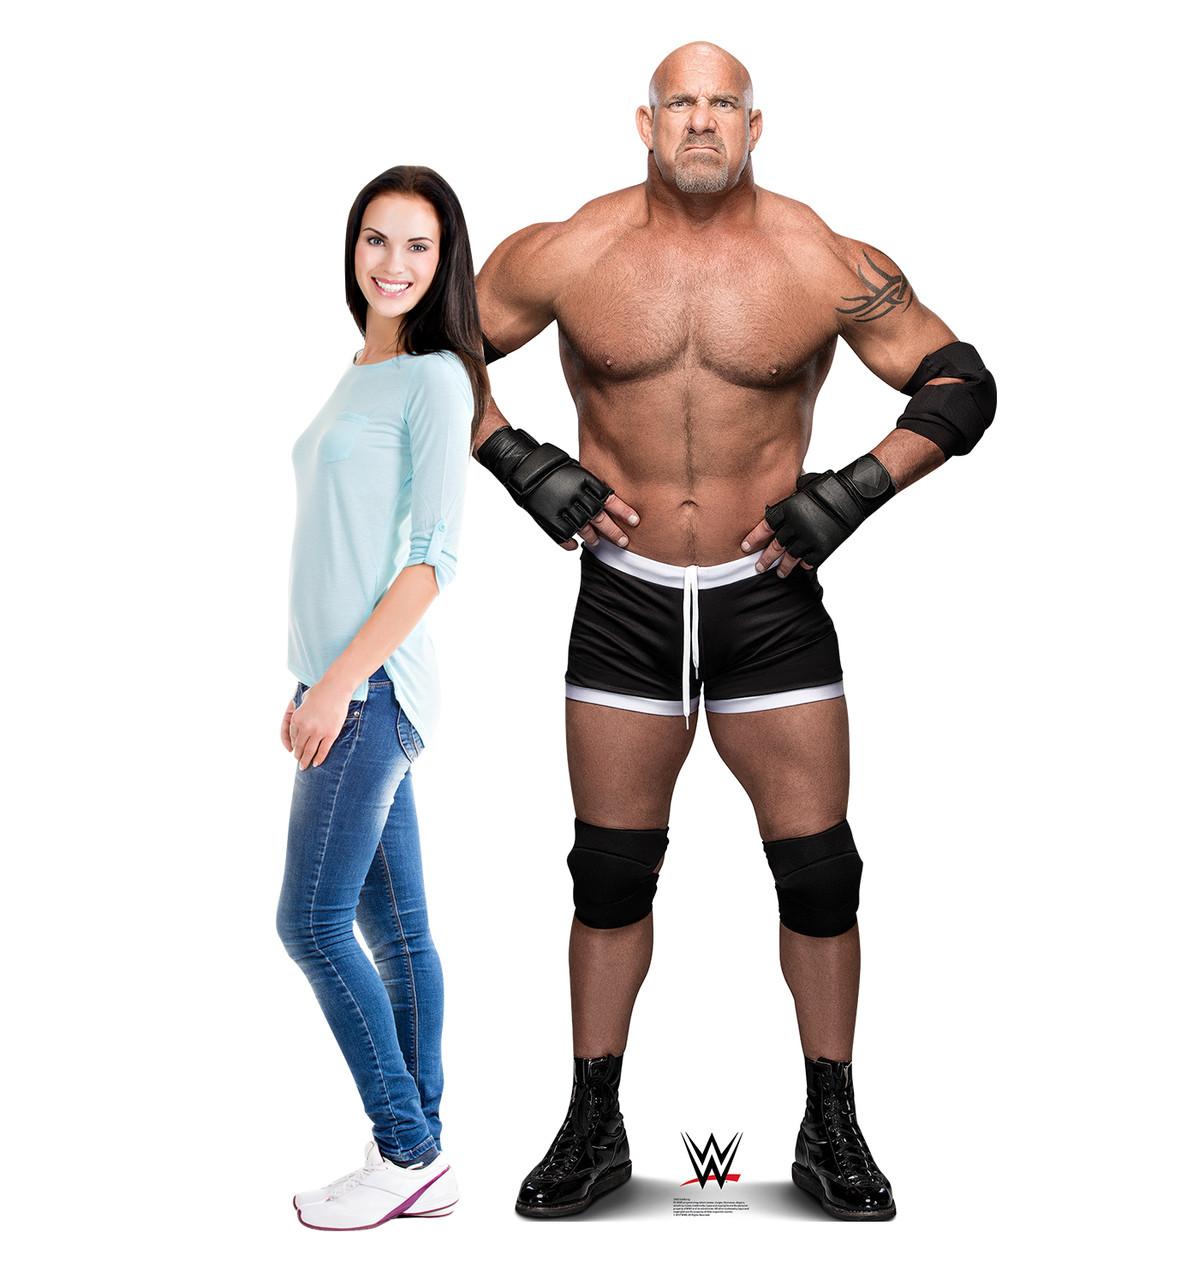 Life-size Goldberg - WWE Cardboard Standup | Cardboard Cutout